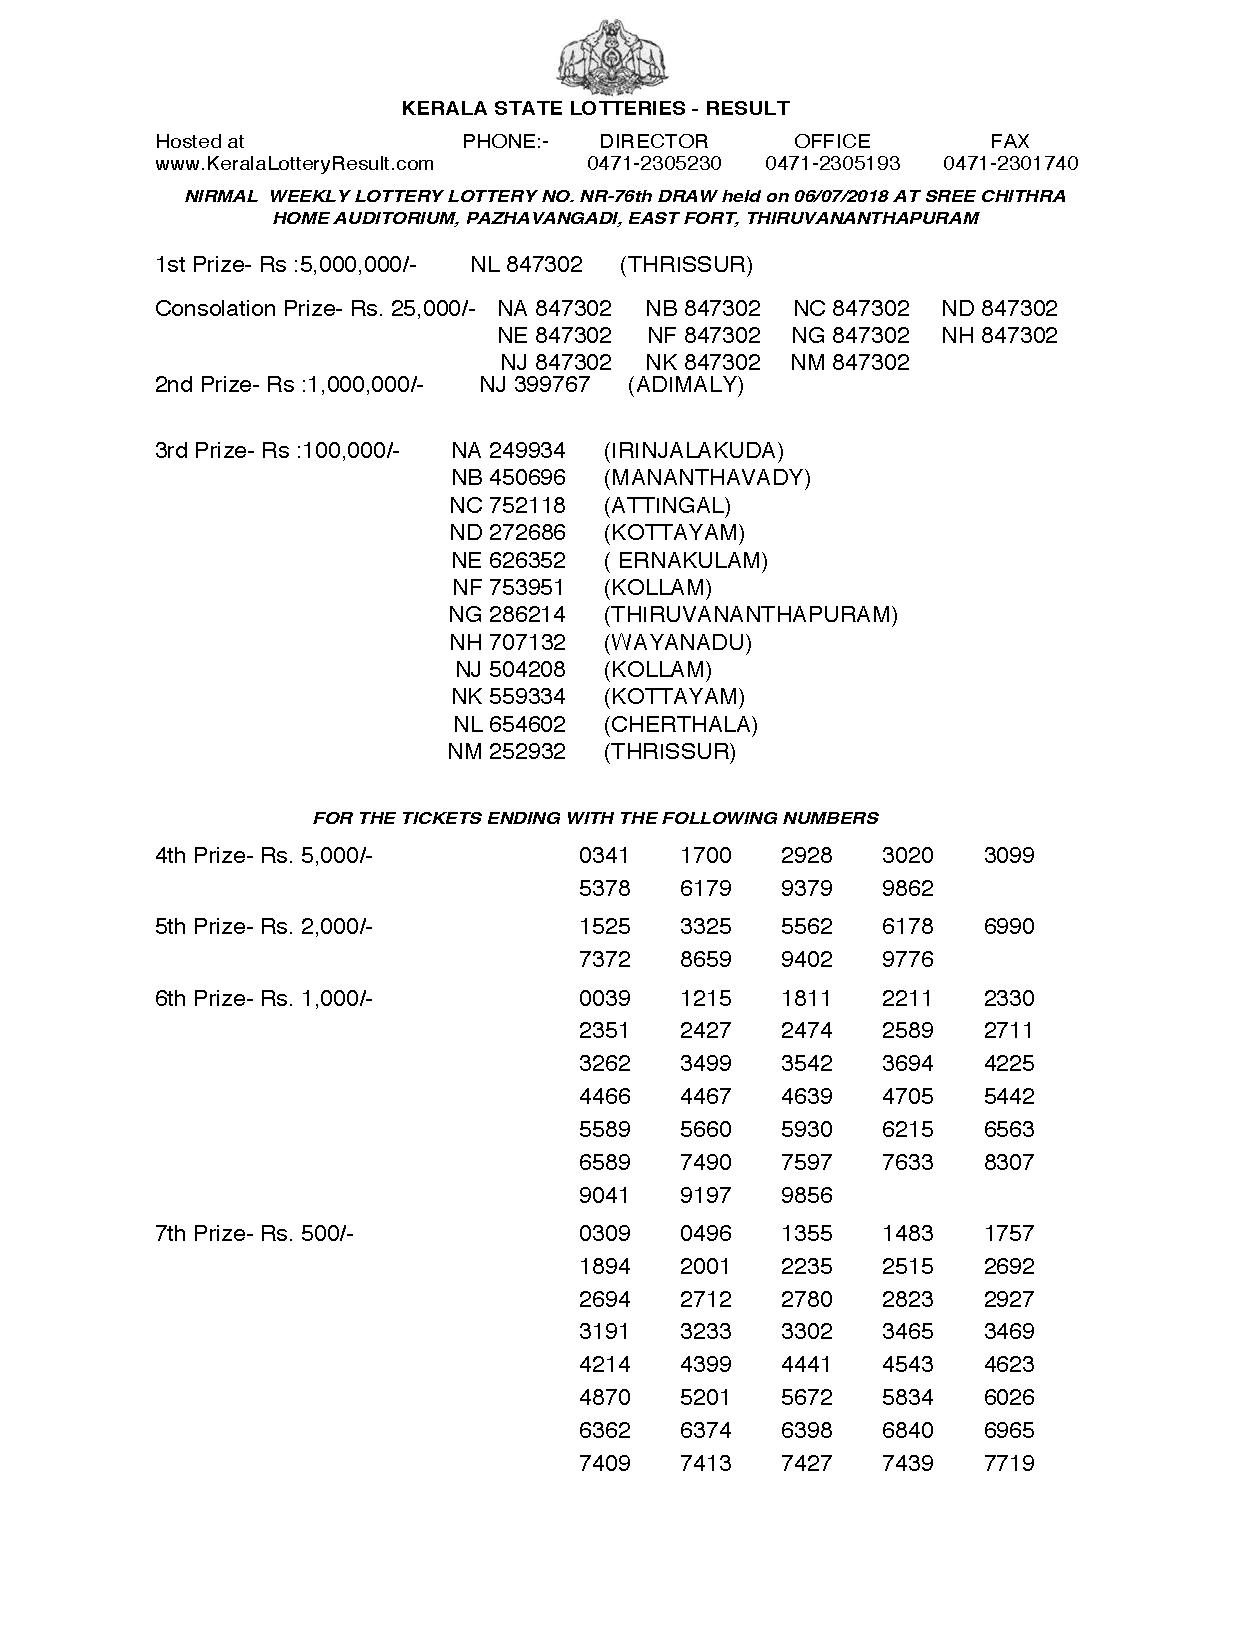 Nirmal NR76 Kerala Lottery Results Screenshot: Page 1